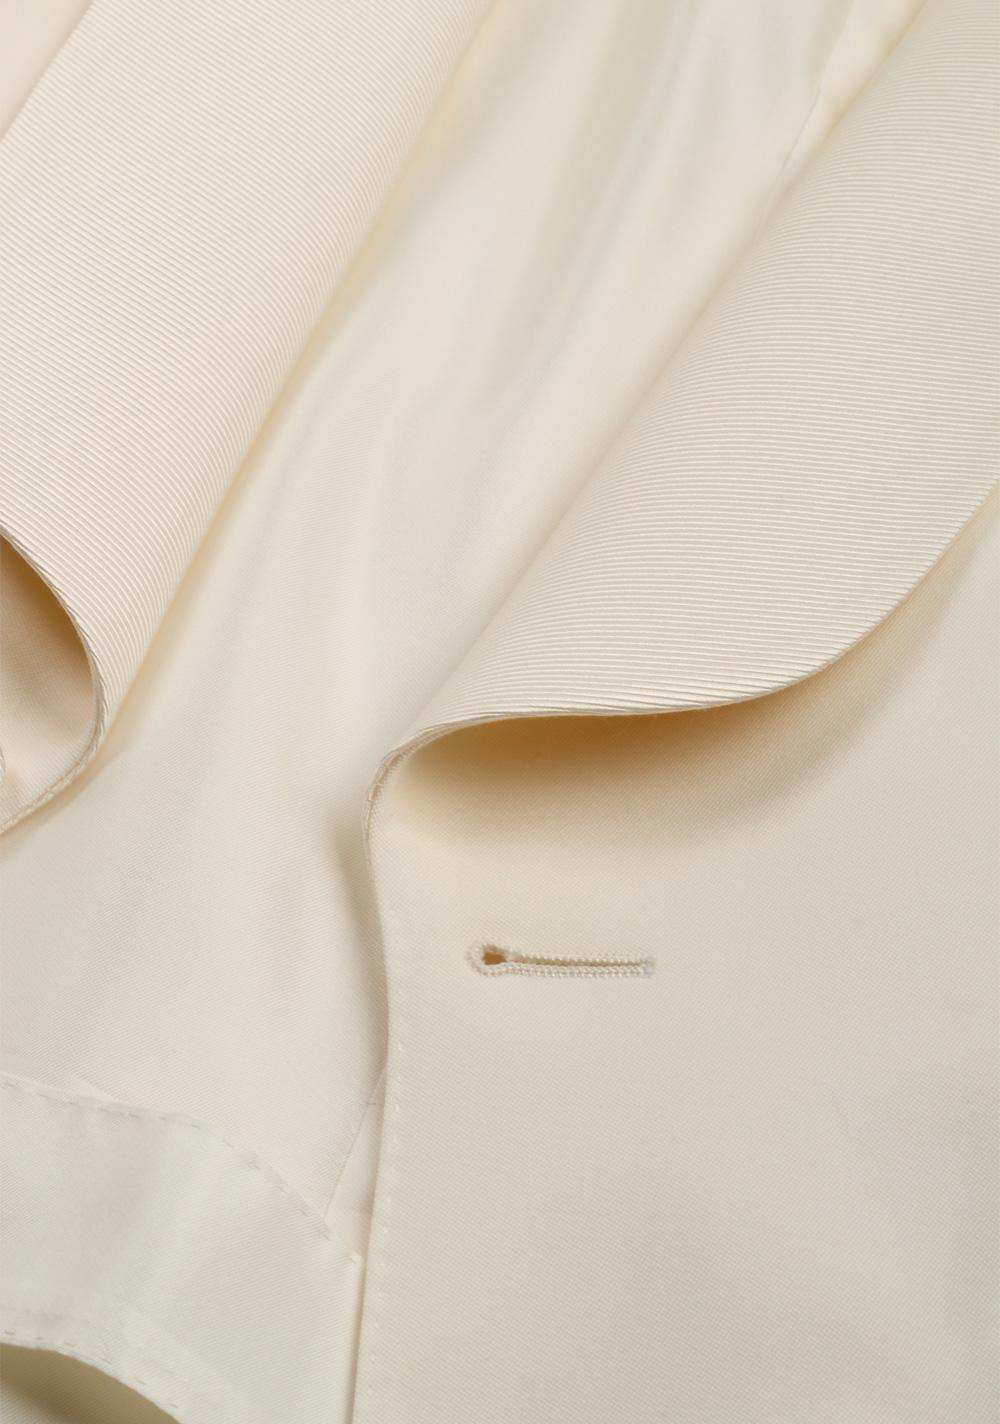 TOM FORD O'Connor Ivory Sport Coat Tuxedo Dinner Jacket | Costume Limité